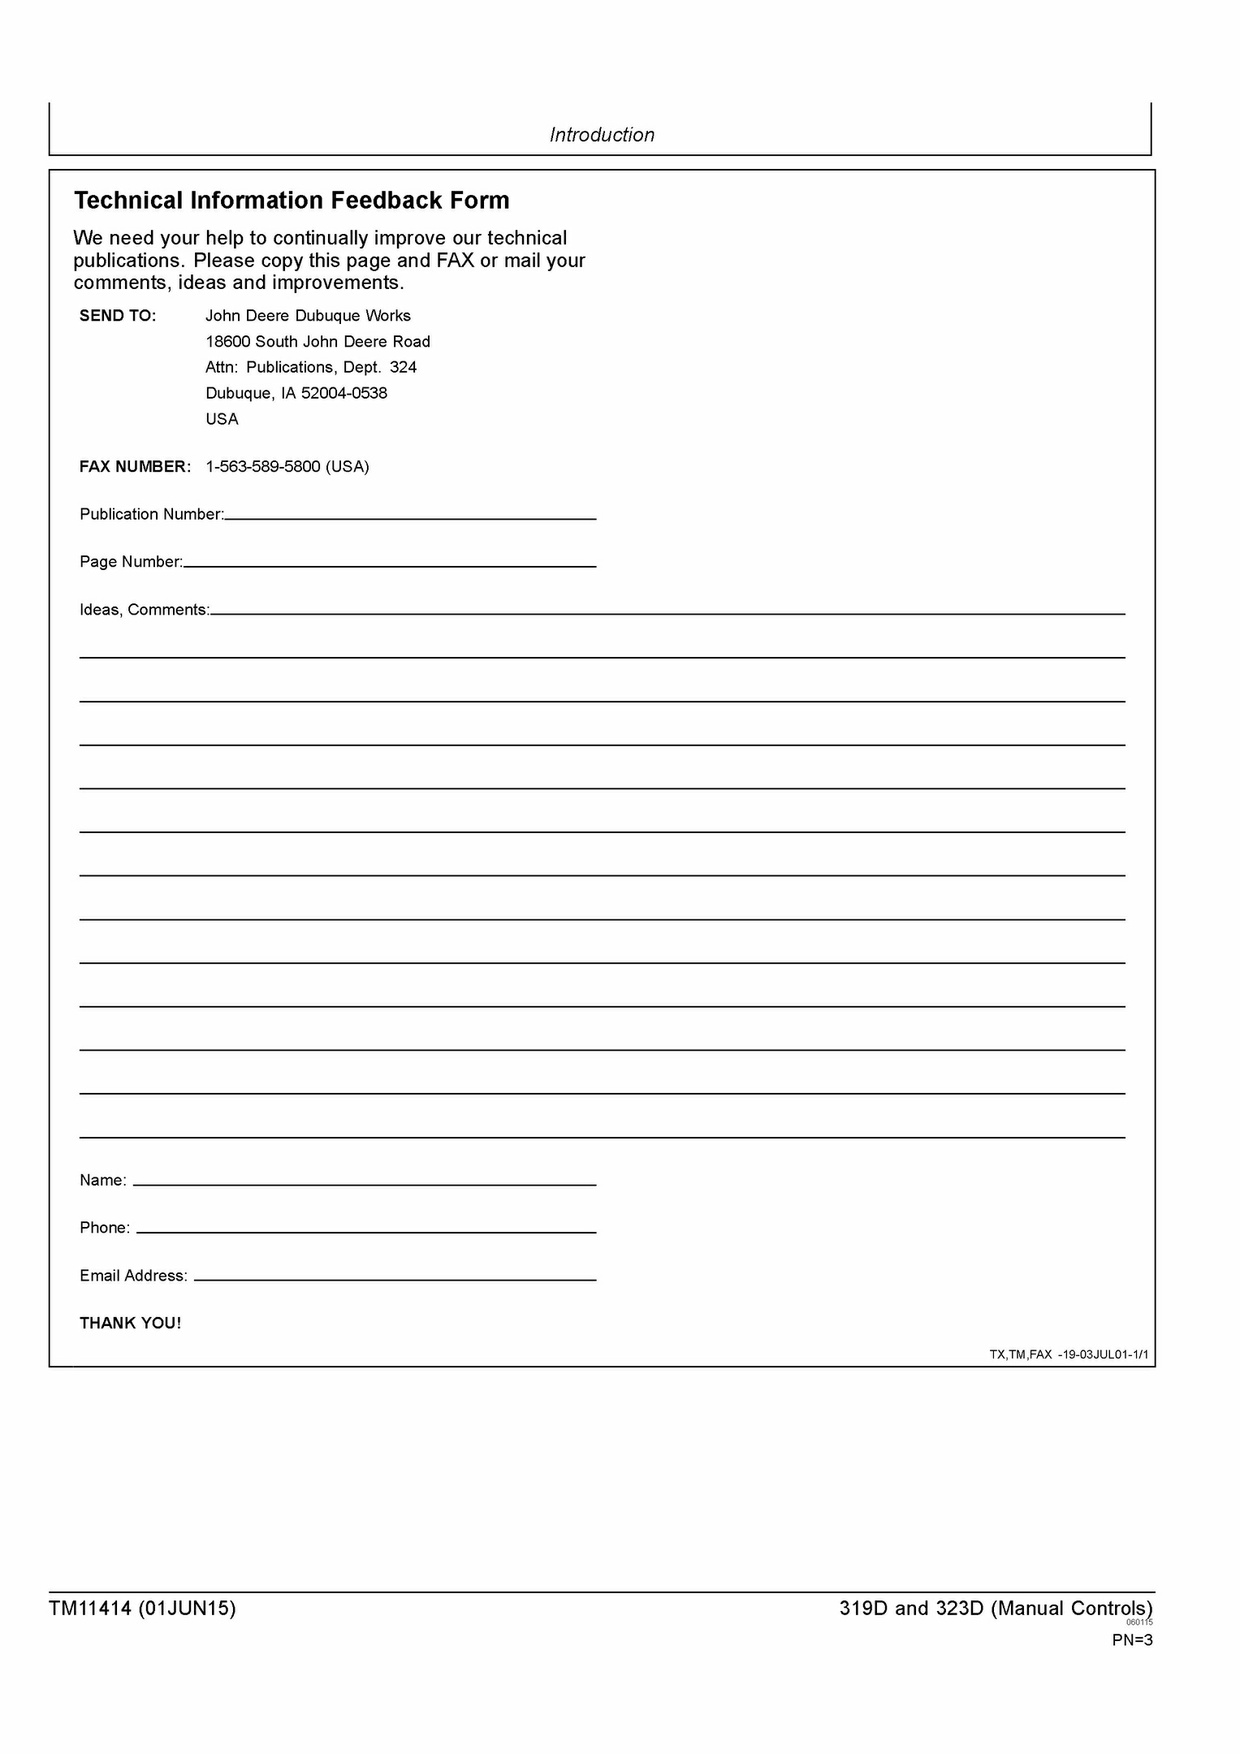 TM11414 JOHN DEERE 319D 323D SKID STEER LOADER (MANUAL CONTROLS) OPERATION AND TEST MANUAL PDF